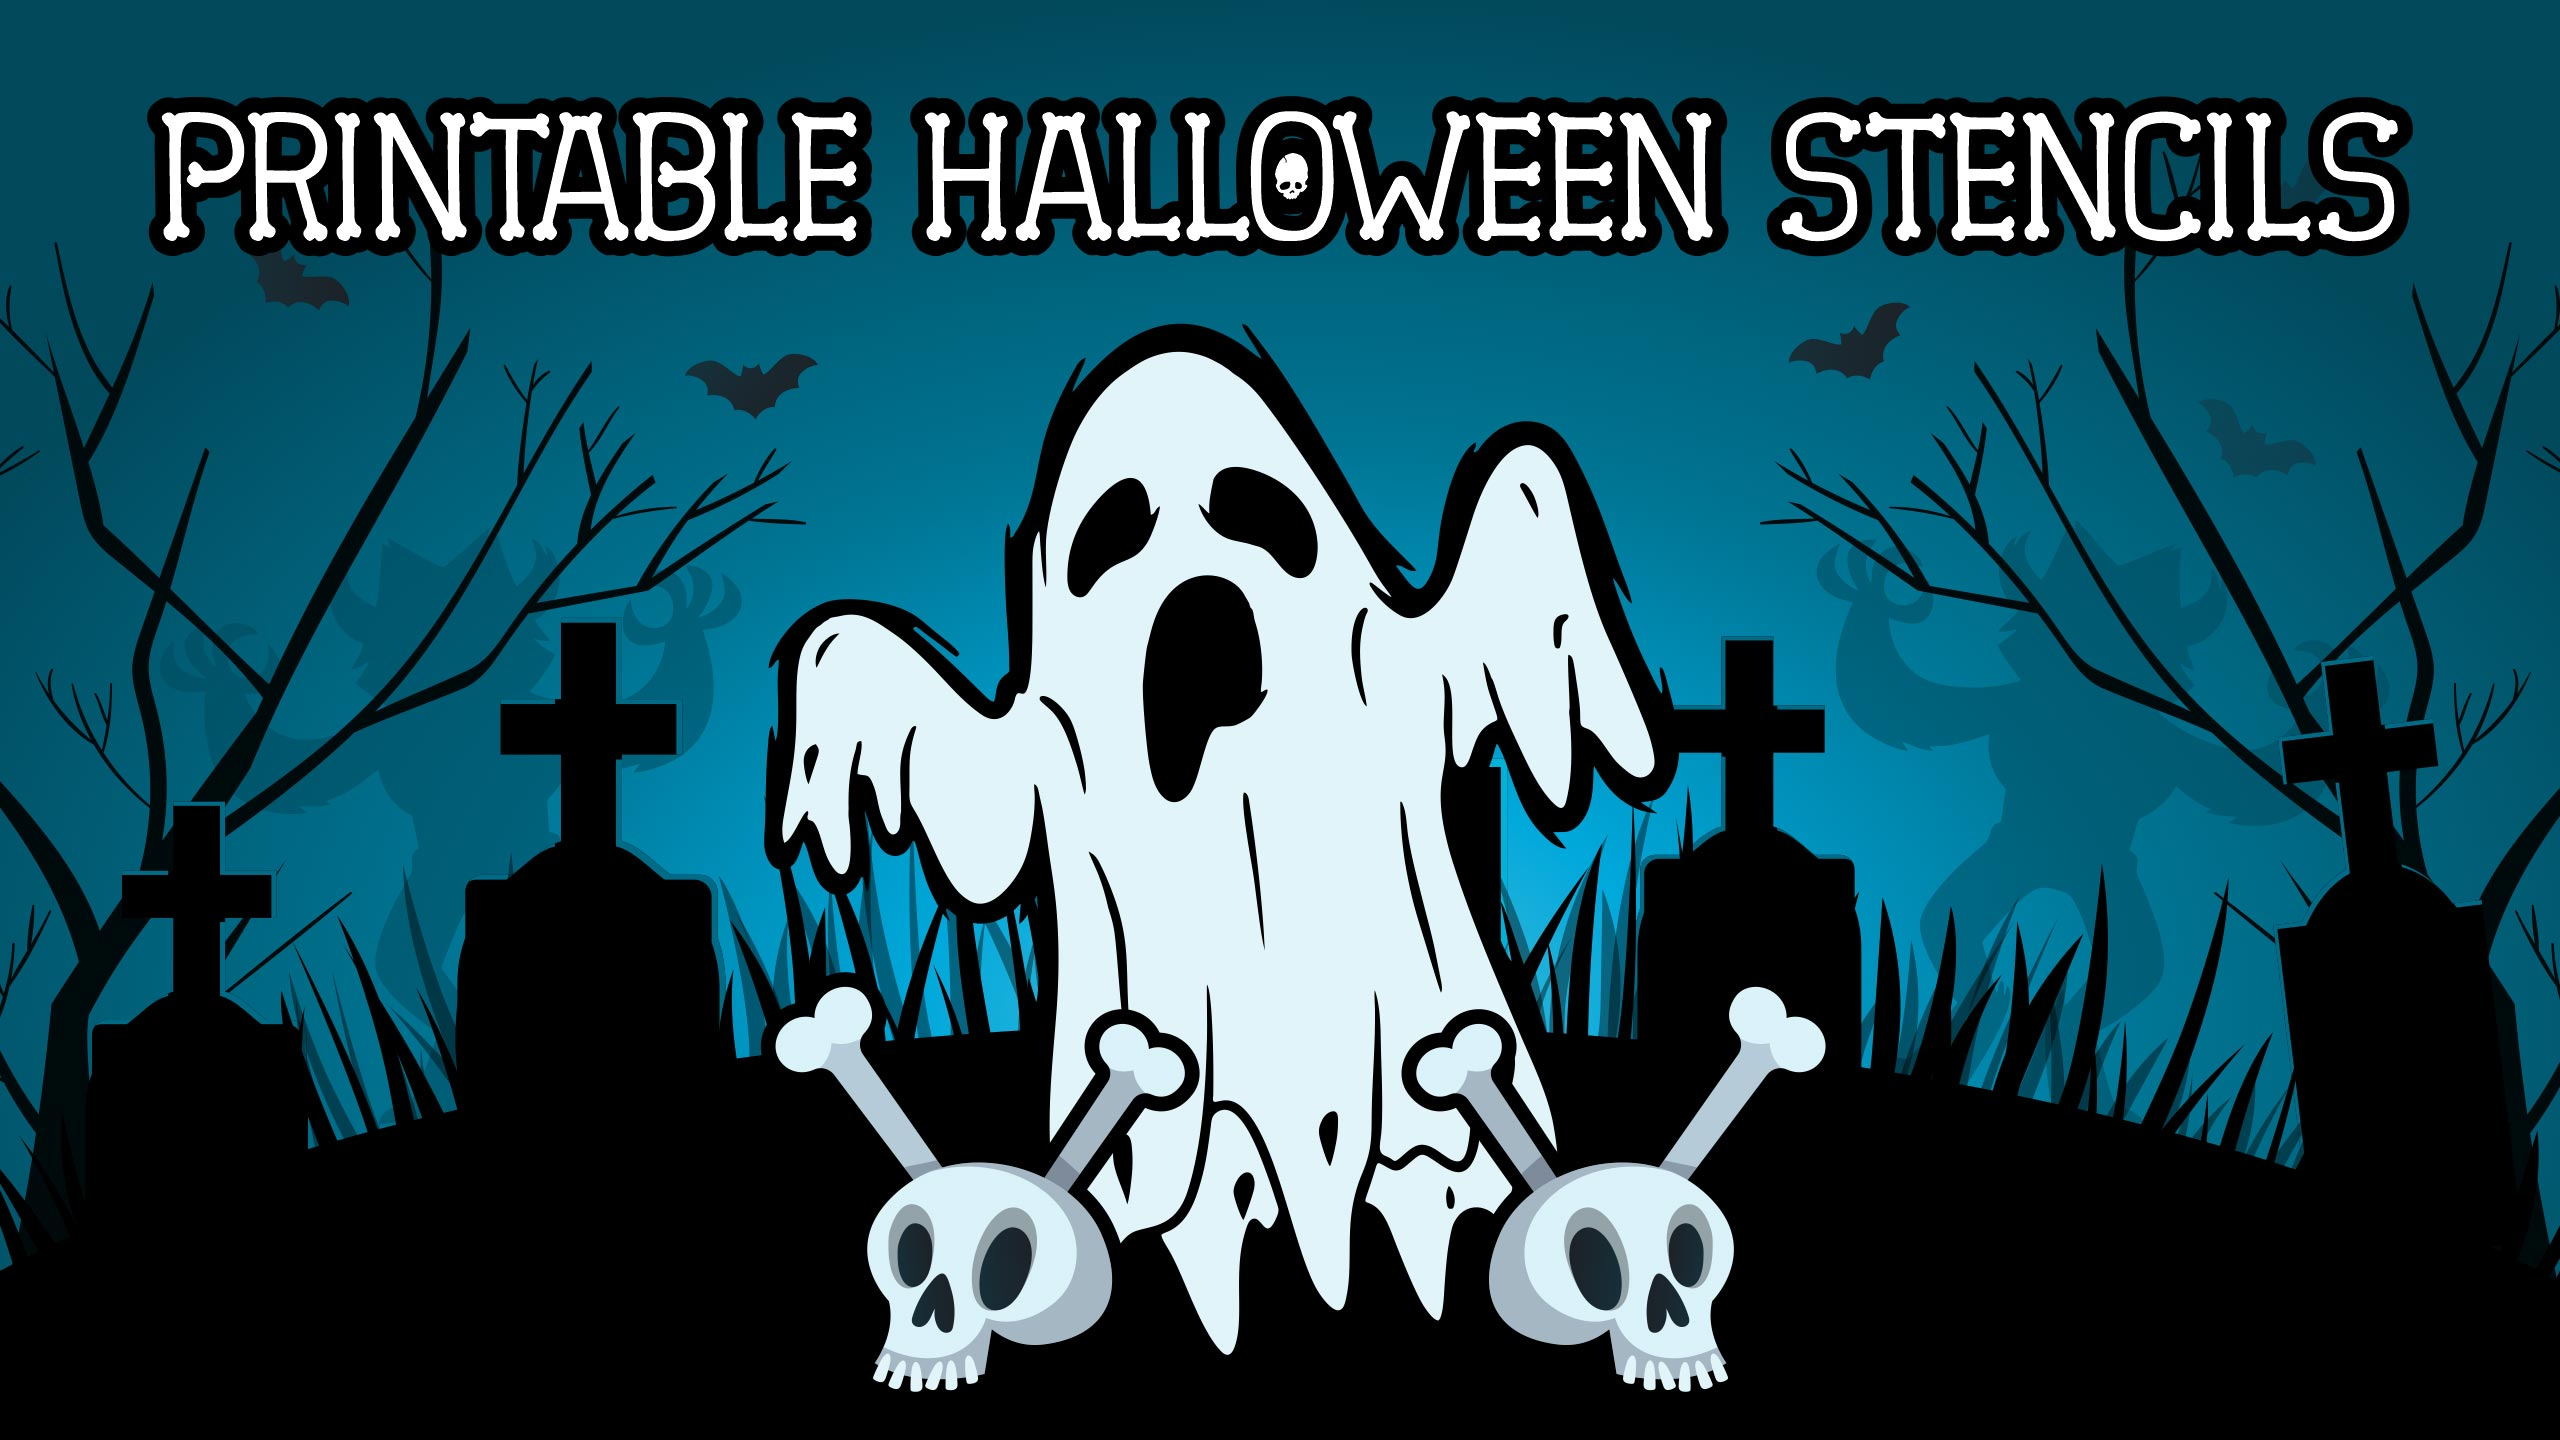 Printable Halloween Stencils